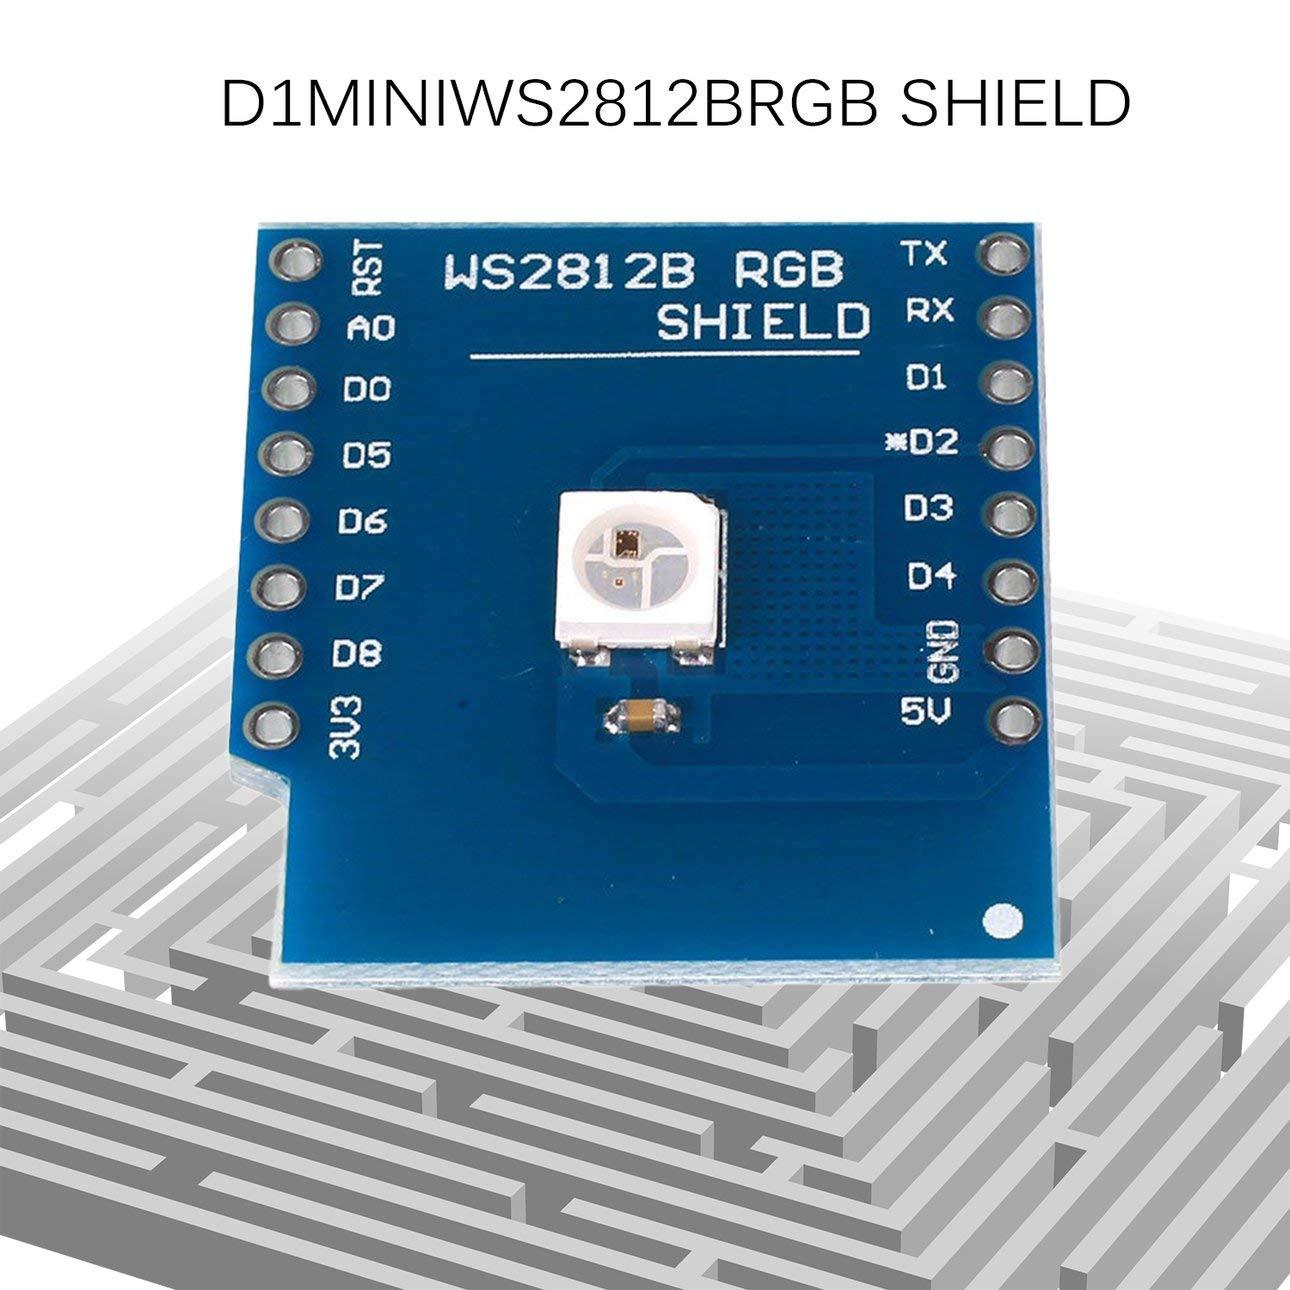 B82422a1103k100 10uh inductor 0,18 un X5